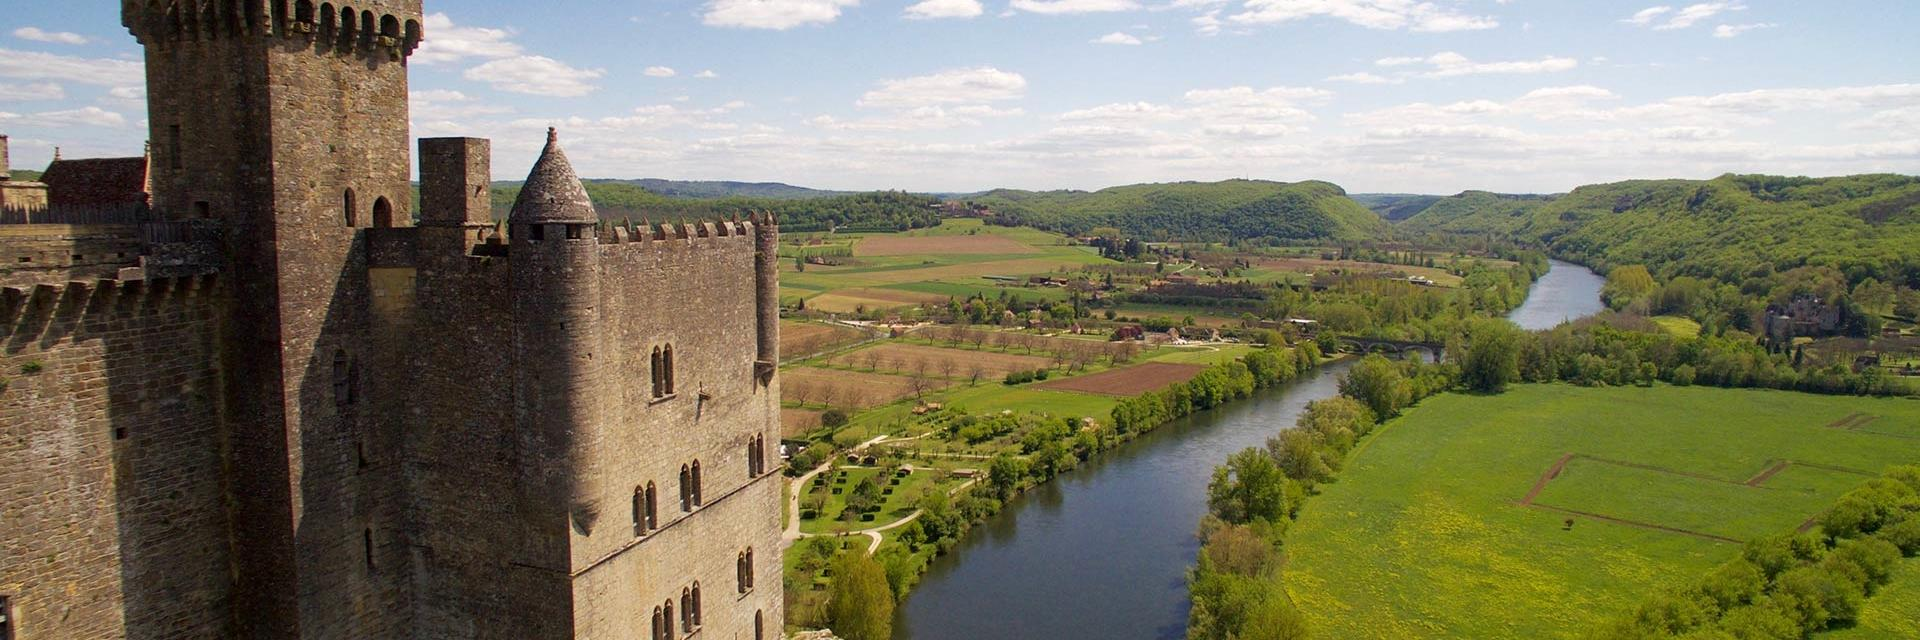 Château de Beynac vue du donjon